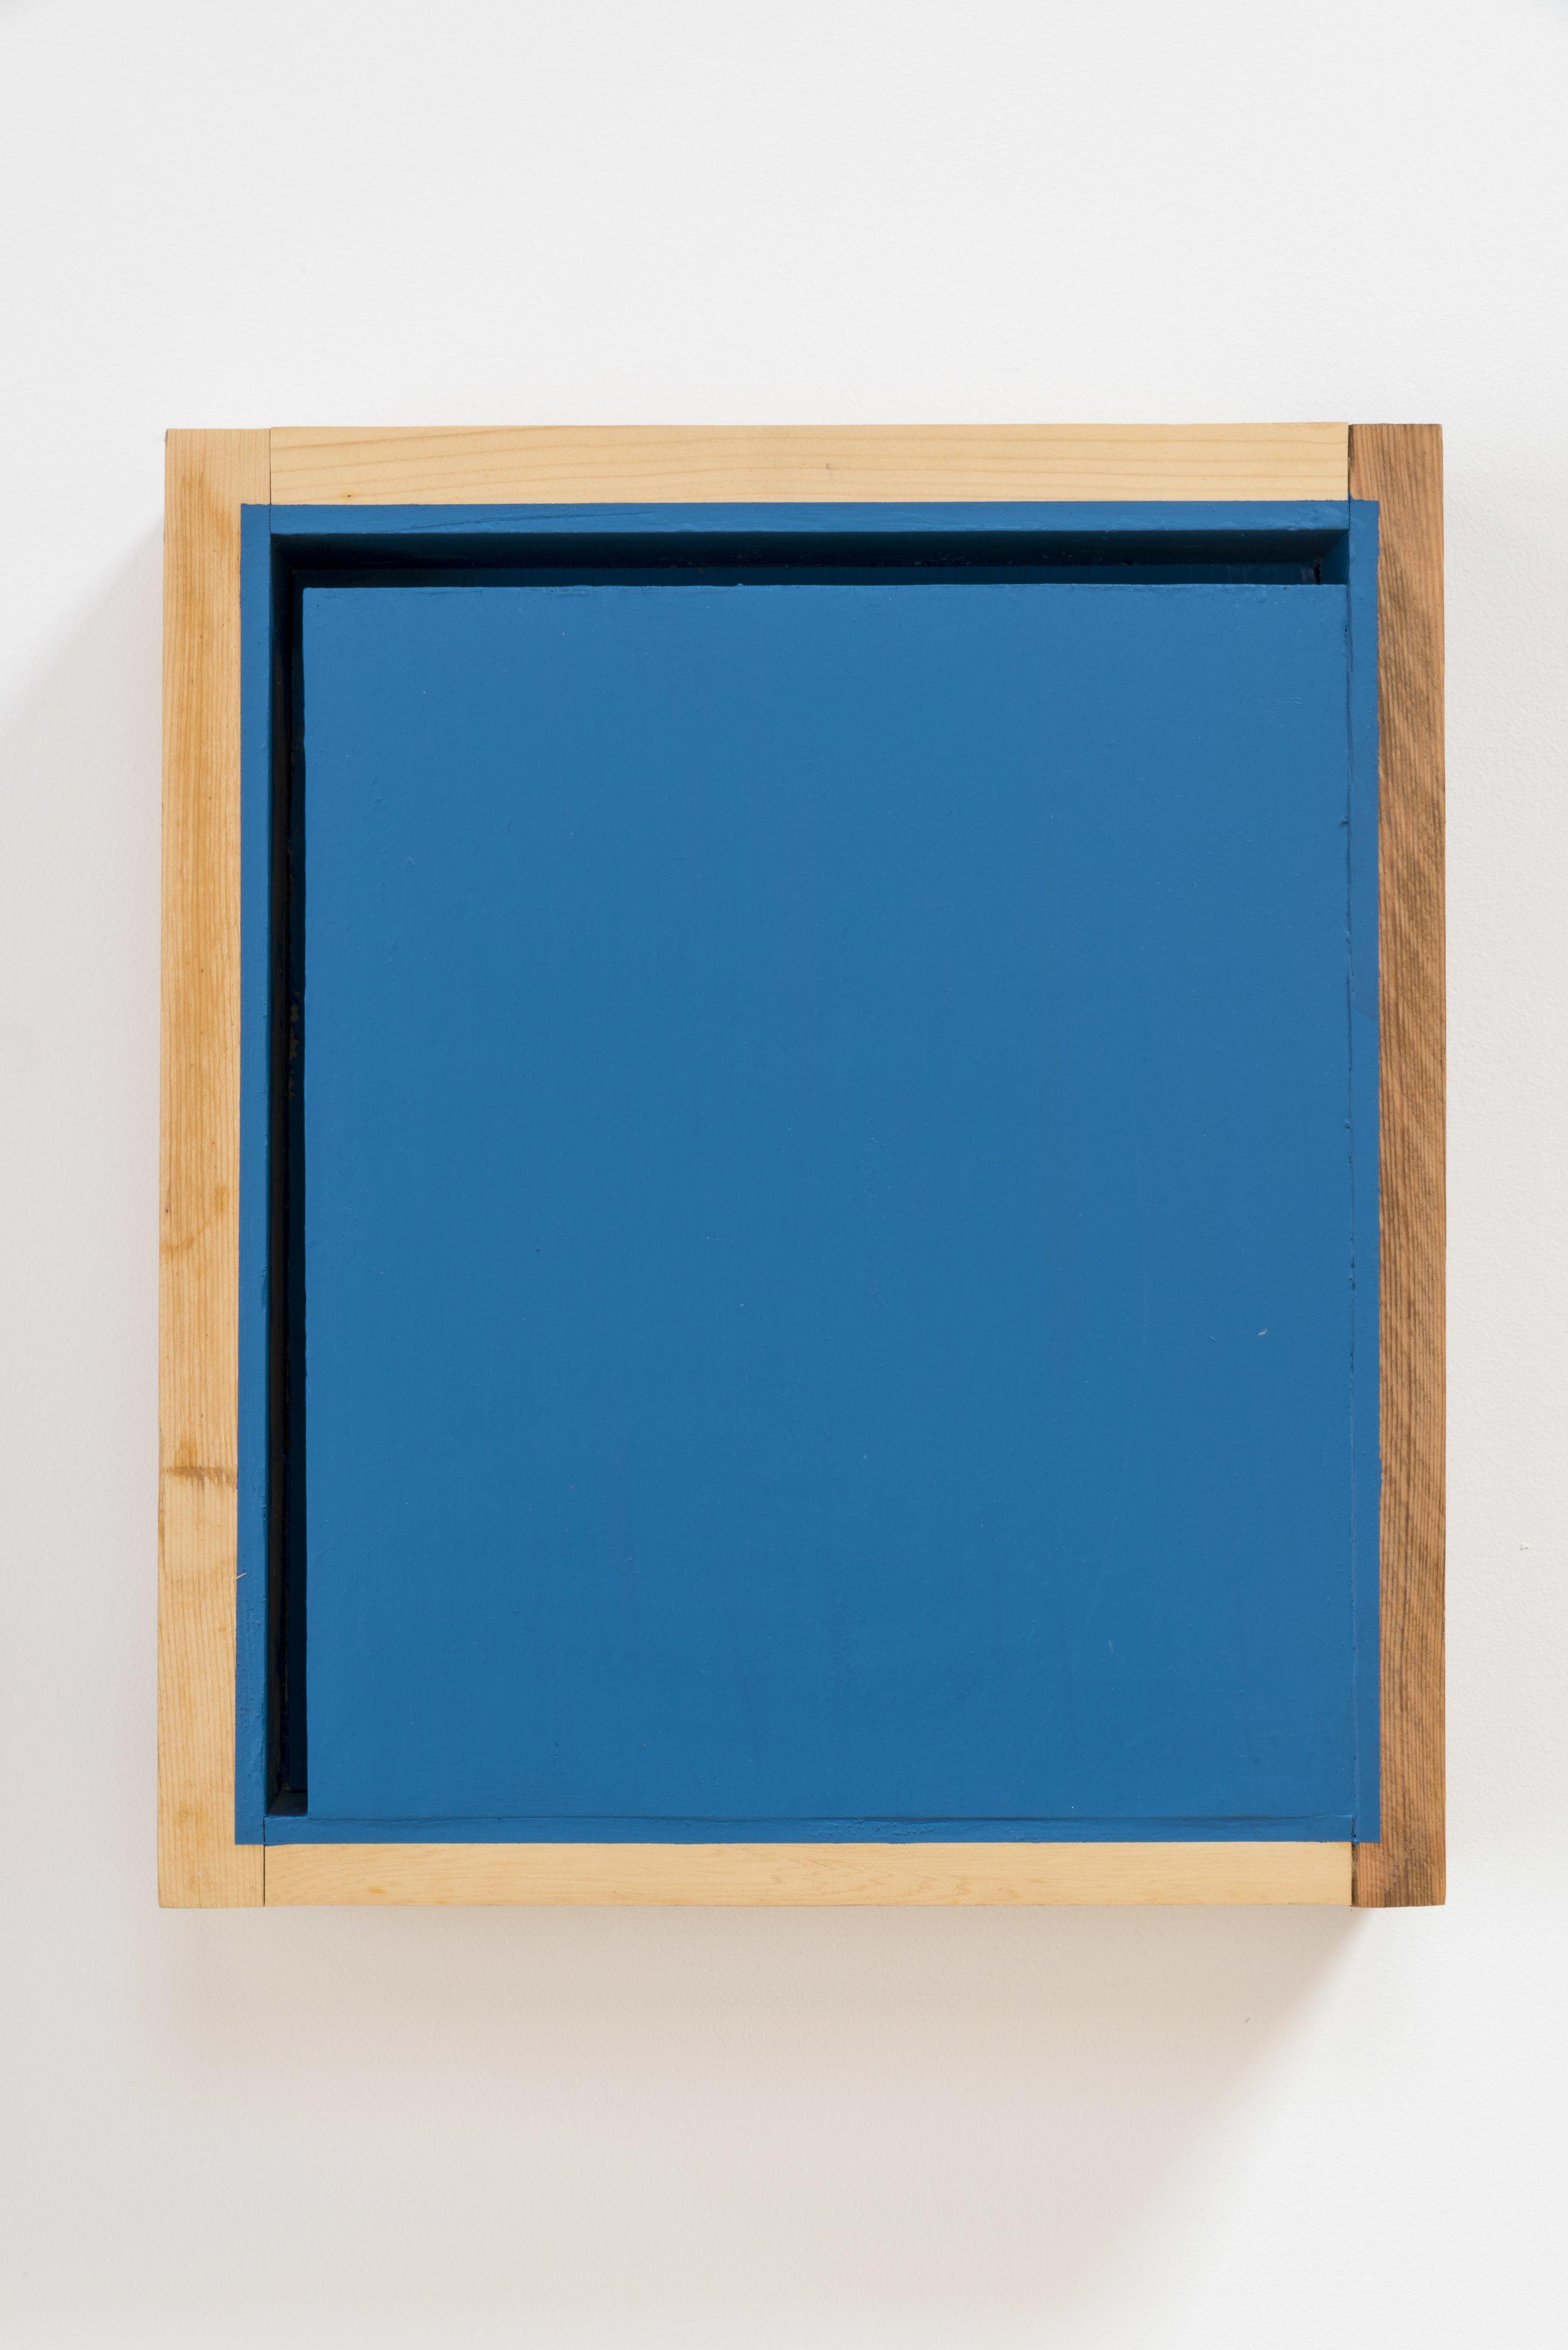 Space in Edges , 2006 短空端 ( Tankūtan ) Wood, acrylic 16 1/8 x 13 3/4 x 4 1/8 inches 41 x 35 x 10.5 cm